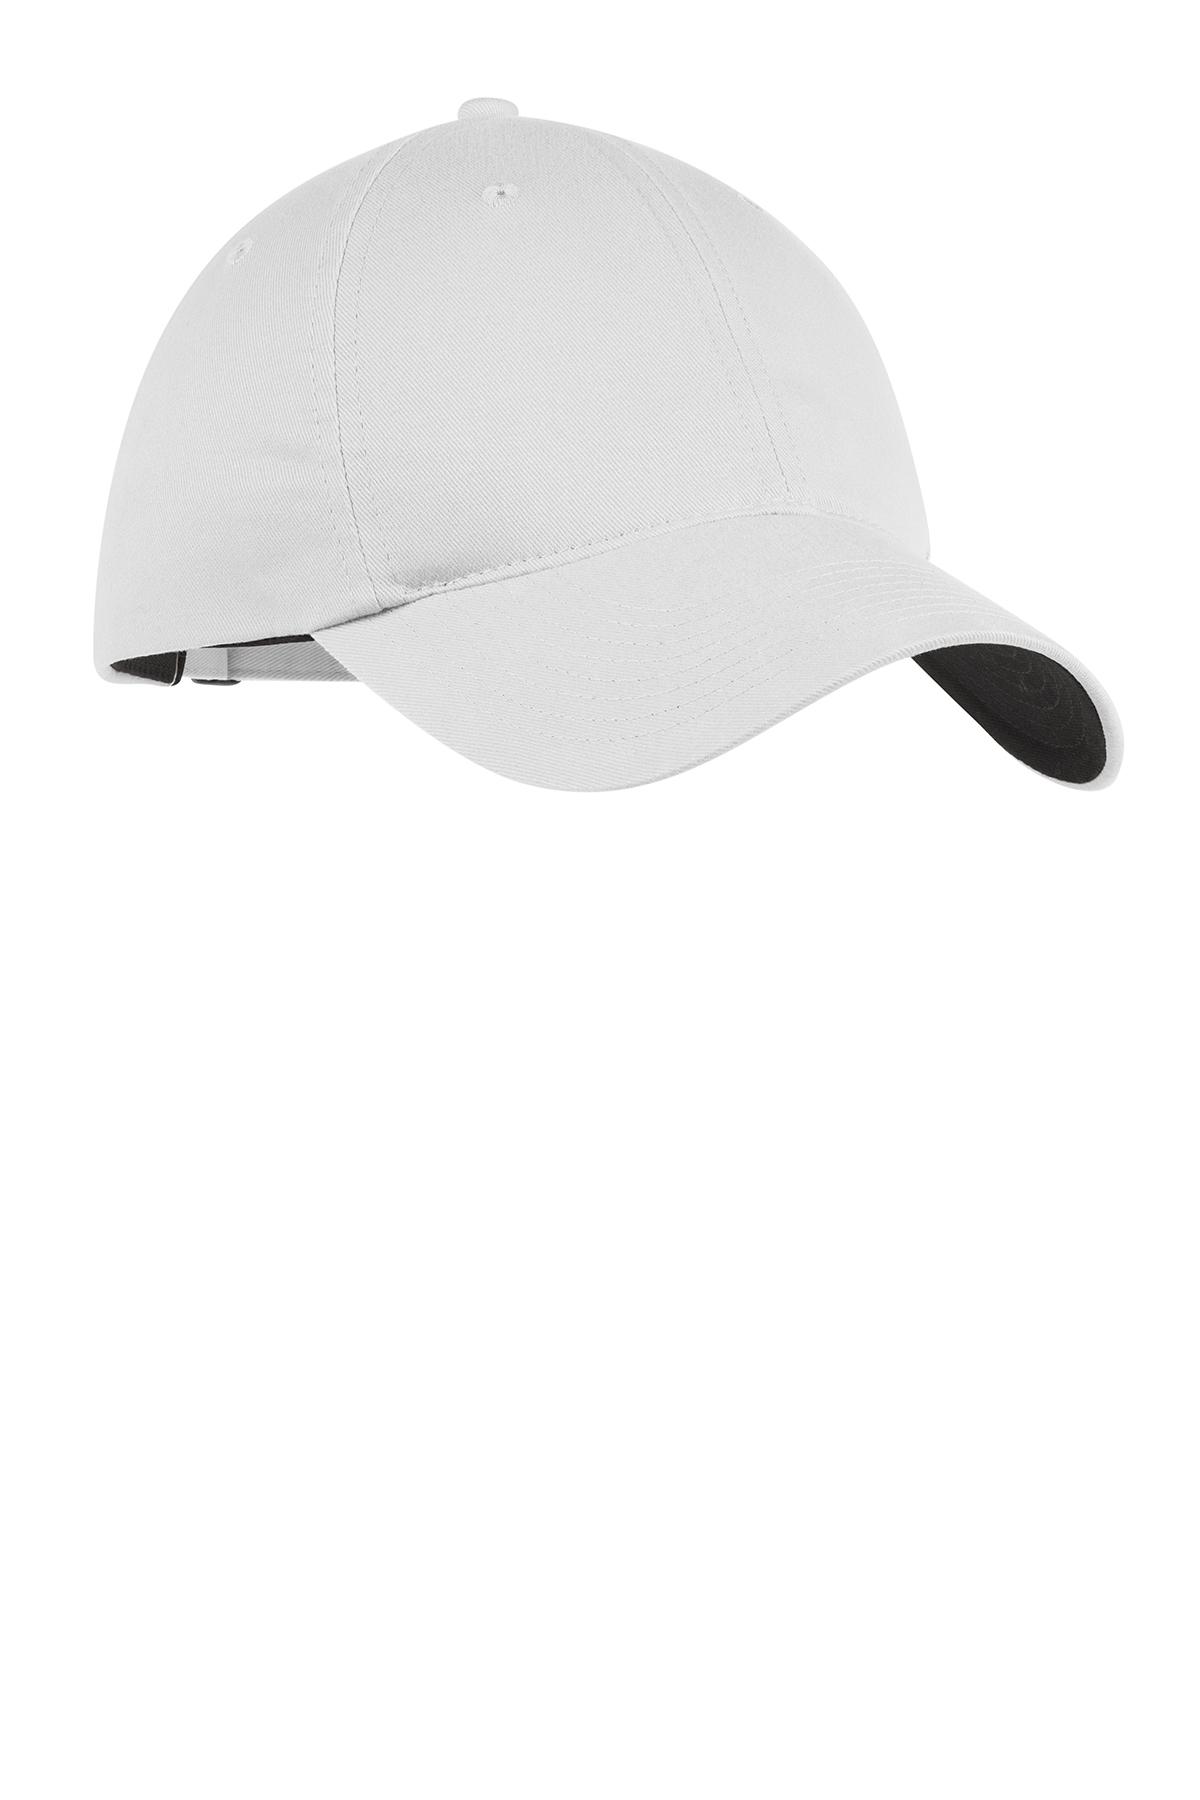 online store a94af de8e7 Nike Unstructured Twill Cap